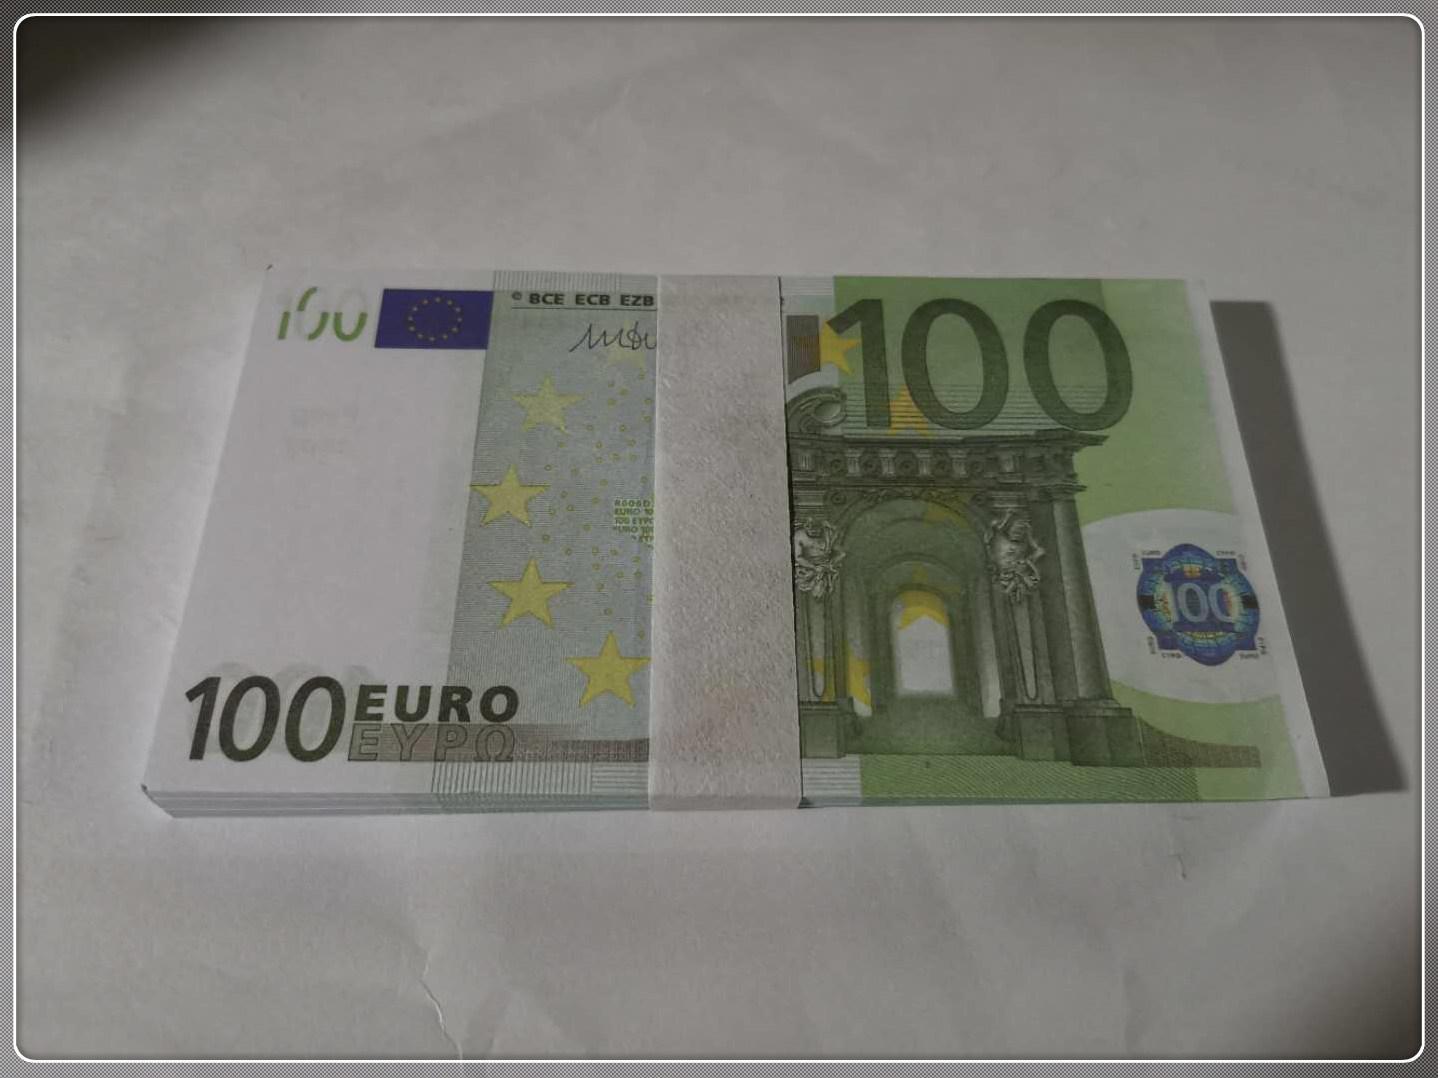 Props New Faux Prop Ticket Papel Papel de Papel Magic Le100-35 100 Billet Regalo Euro Toy Money Euro NQxop Uqicq